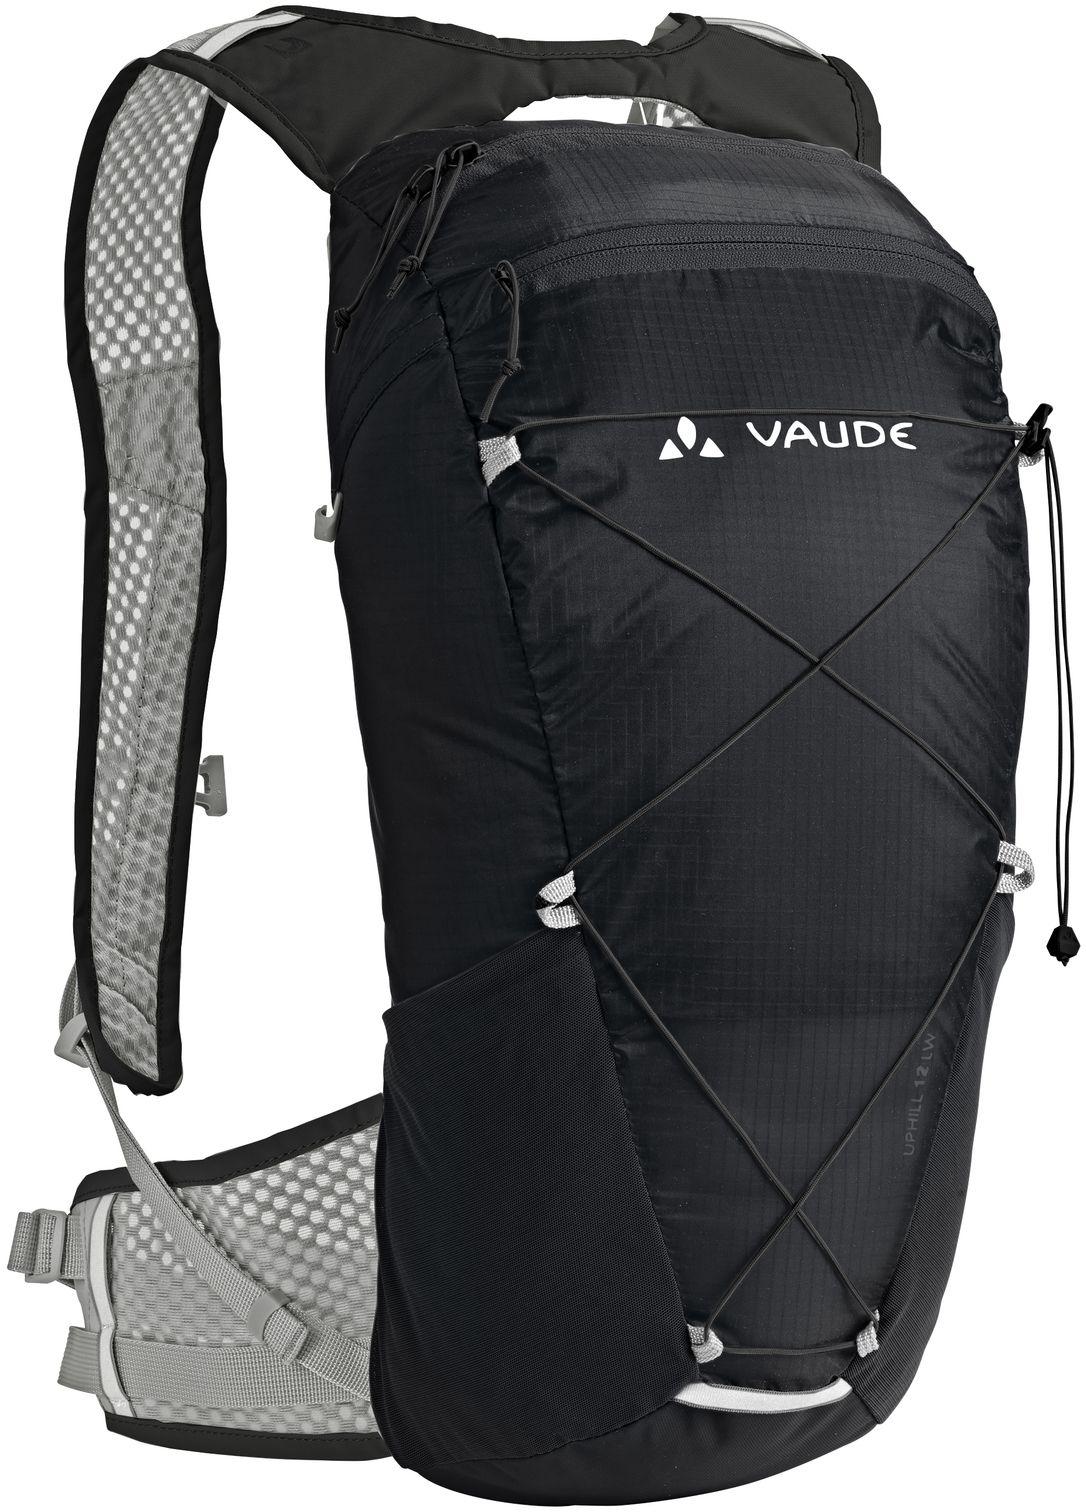 Vaude Uphill 16 LW - black uni